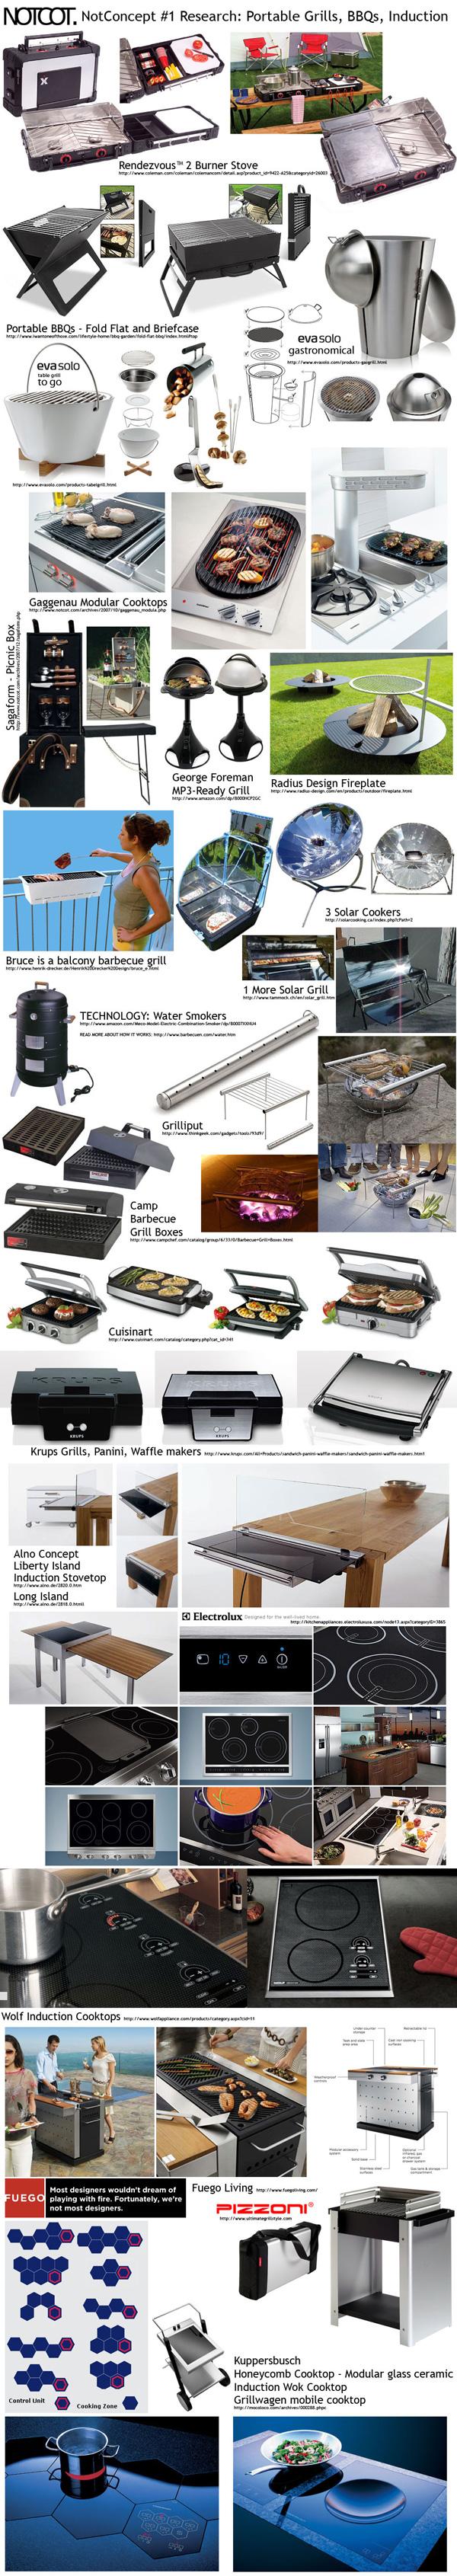 grillresearch.jpg